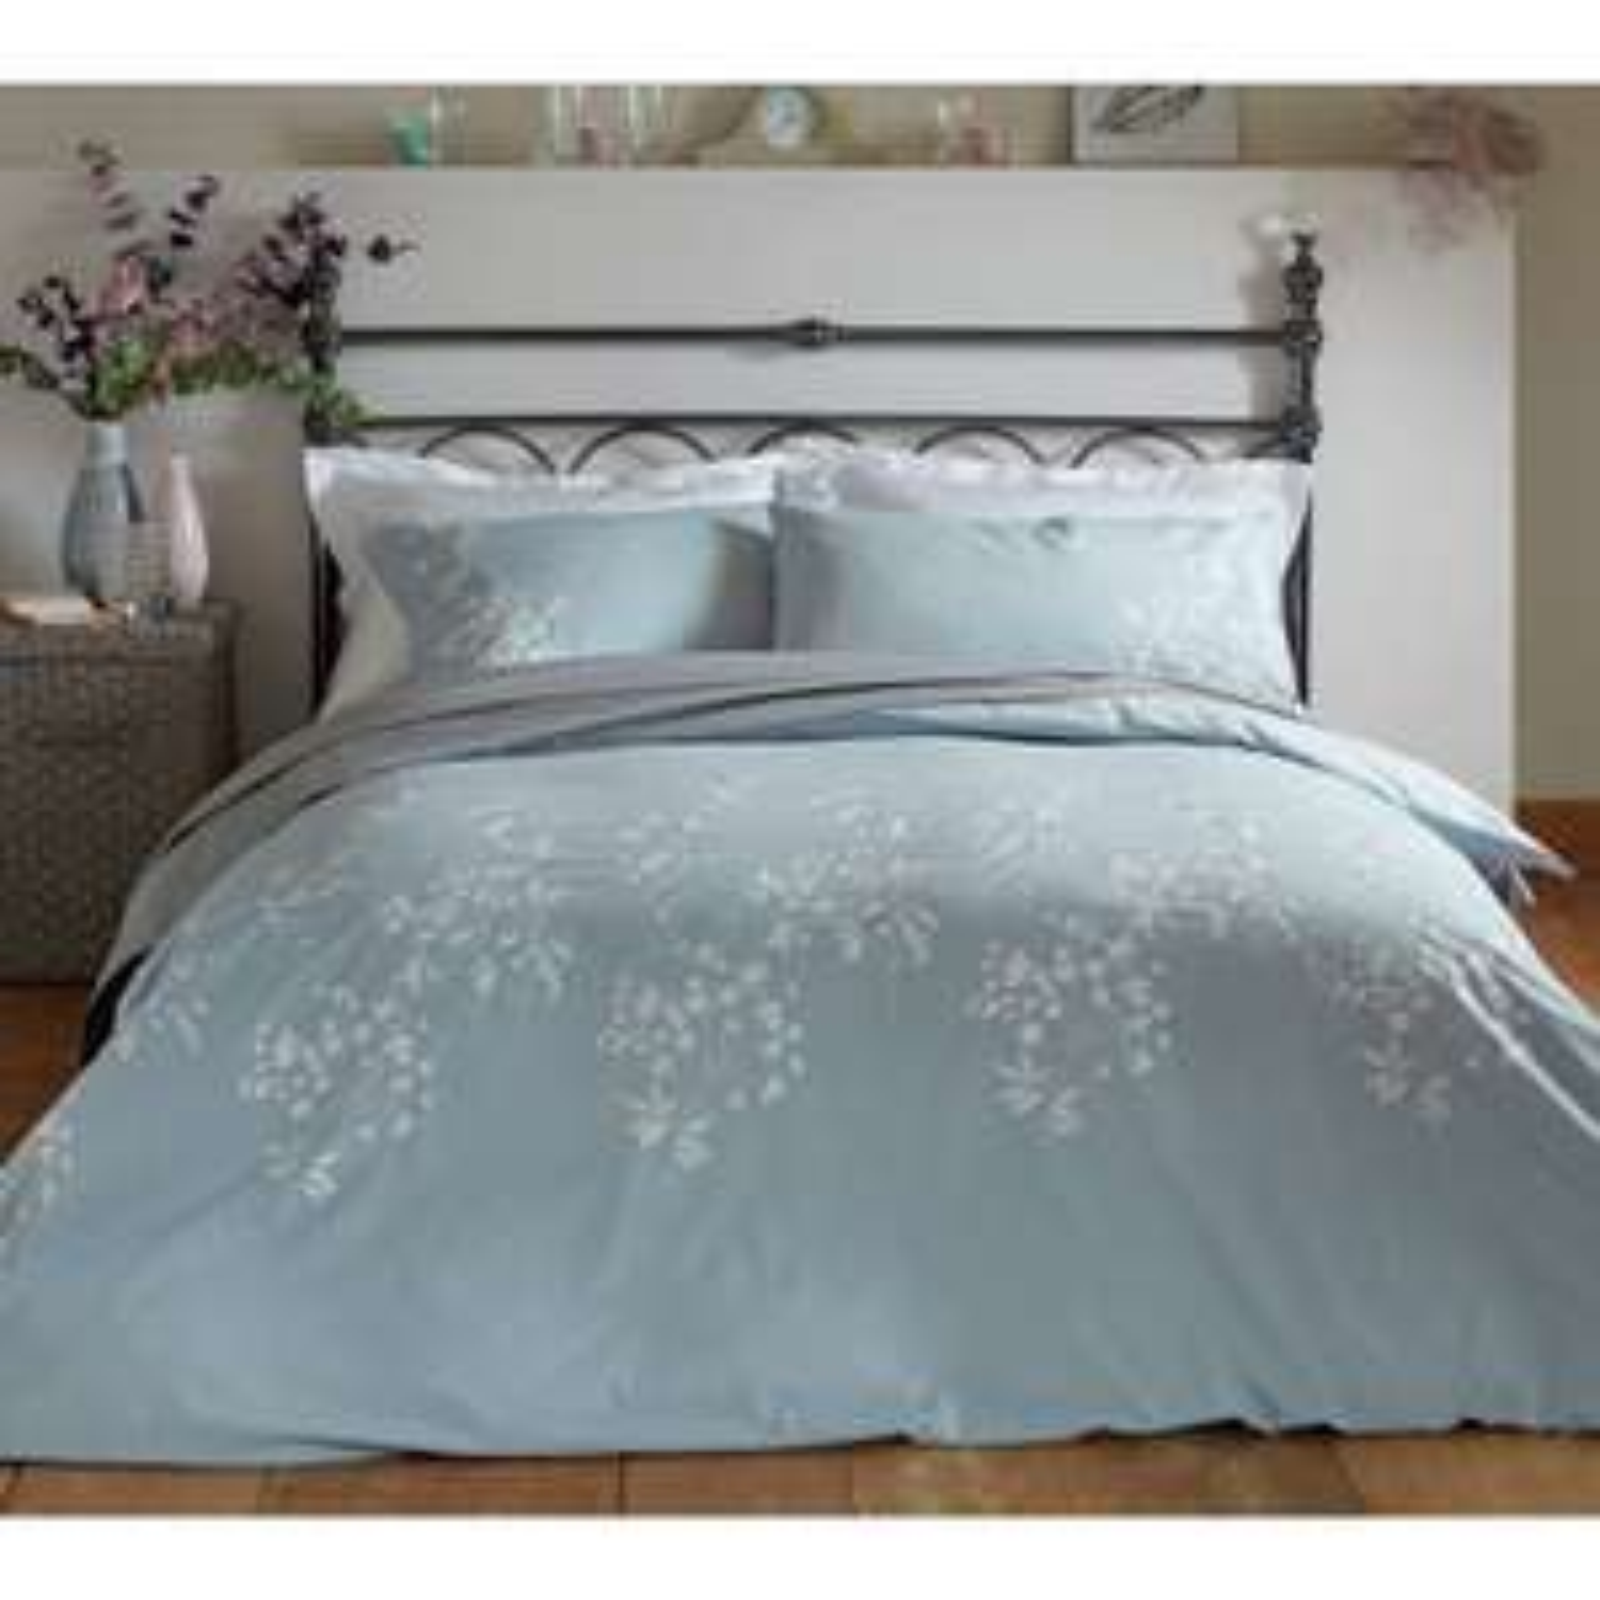 100% Cotton Percale  Embroidered Super kingsize  Bedding Set - £13.99 Delivered Argos on eBay